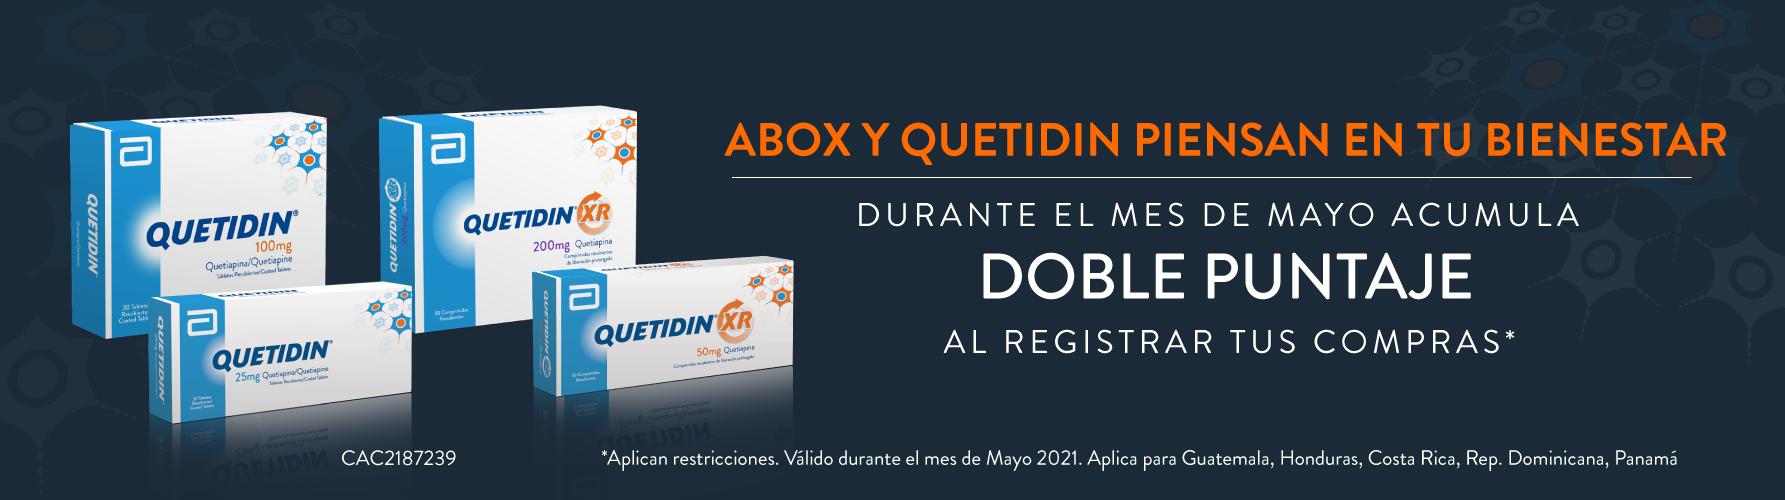 Quetidin-Doble-Puntaje-1785x500px